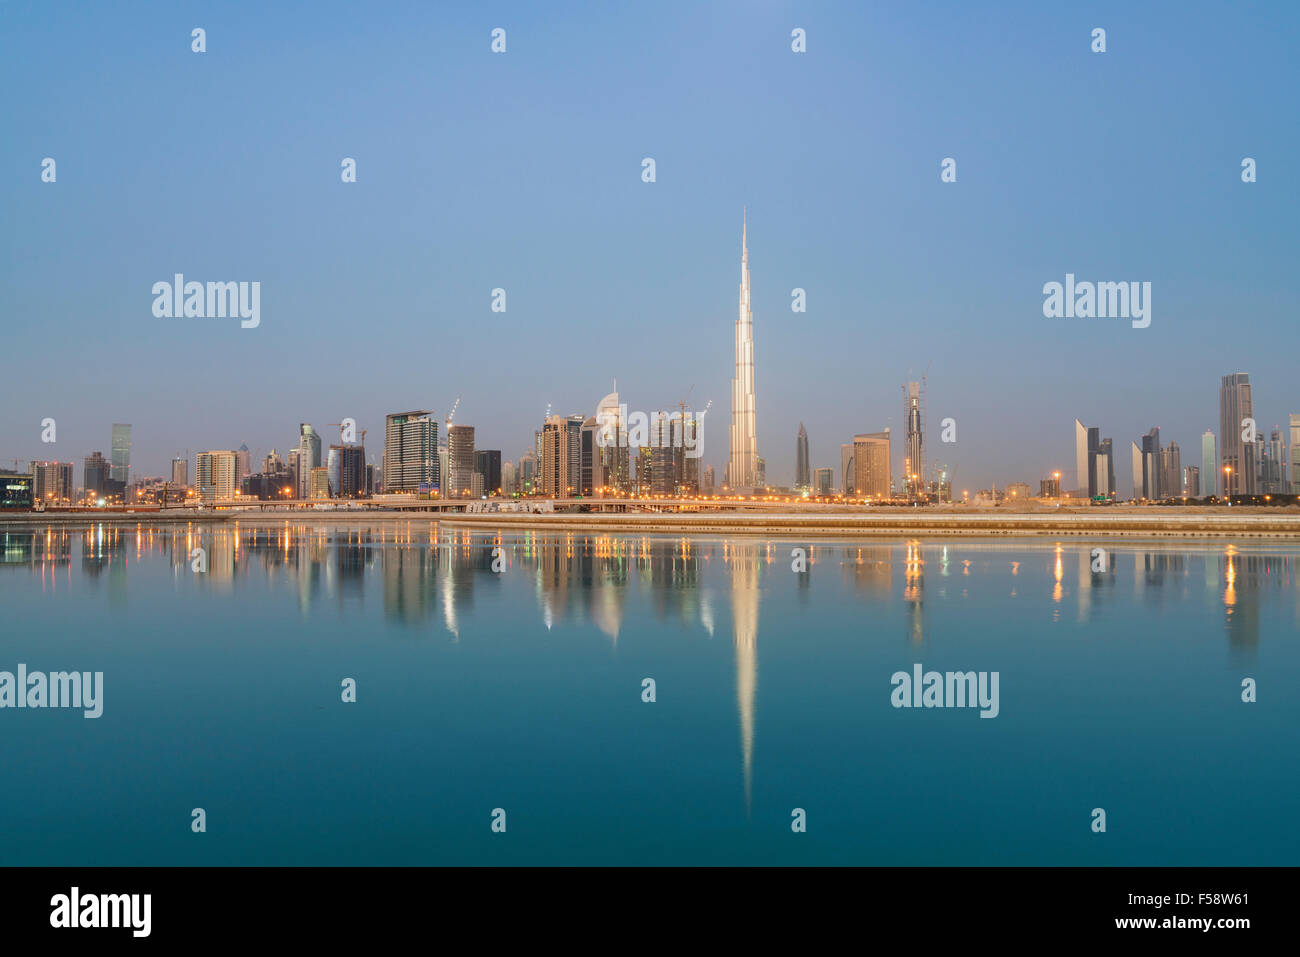 Horizonte de rascacielos y Burj Khalifa torre antes de amanecer en Dubai, Emiratos Árabes Unidos Imagen De Stock